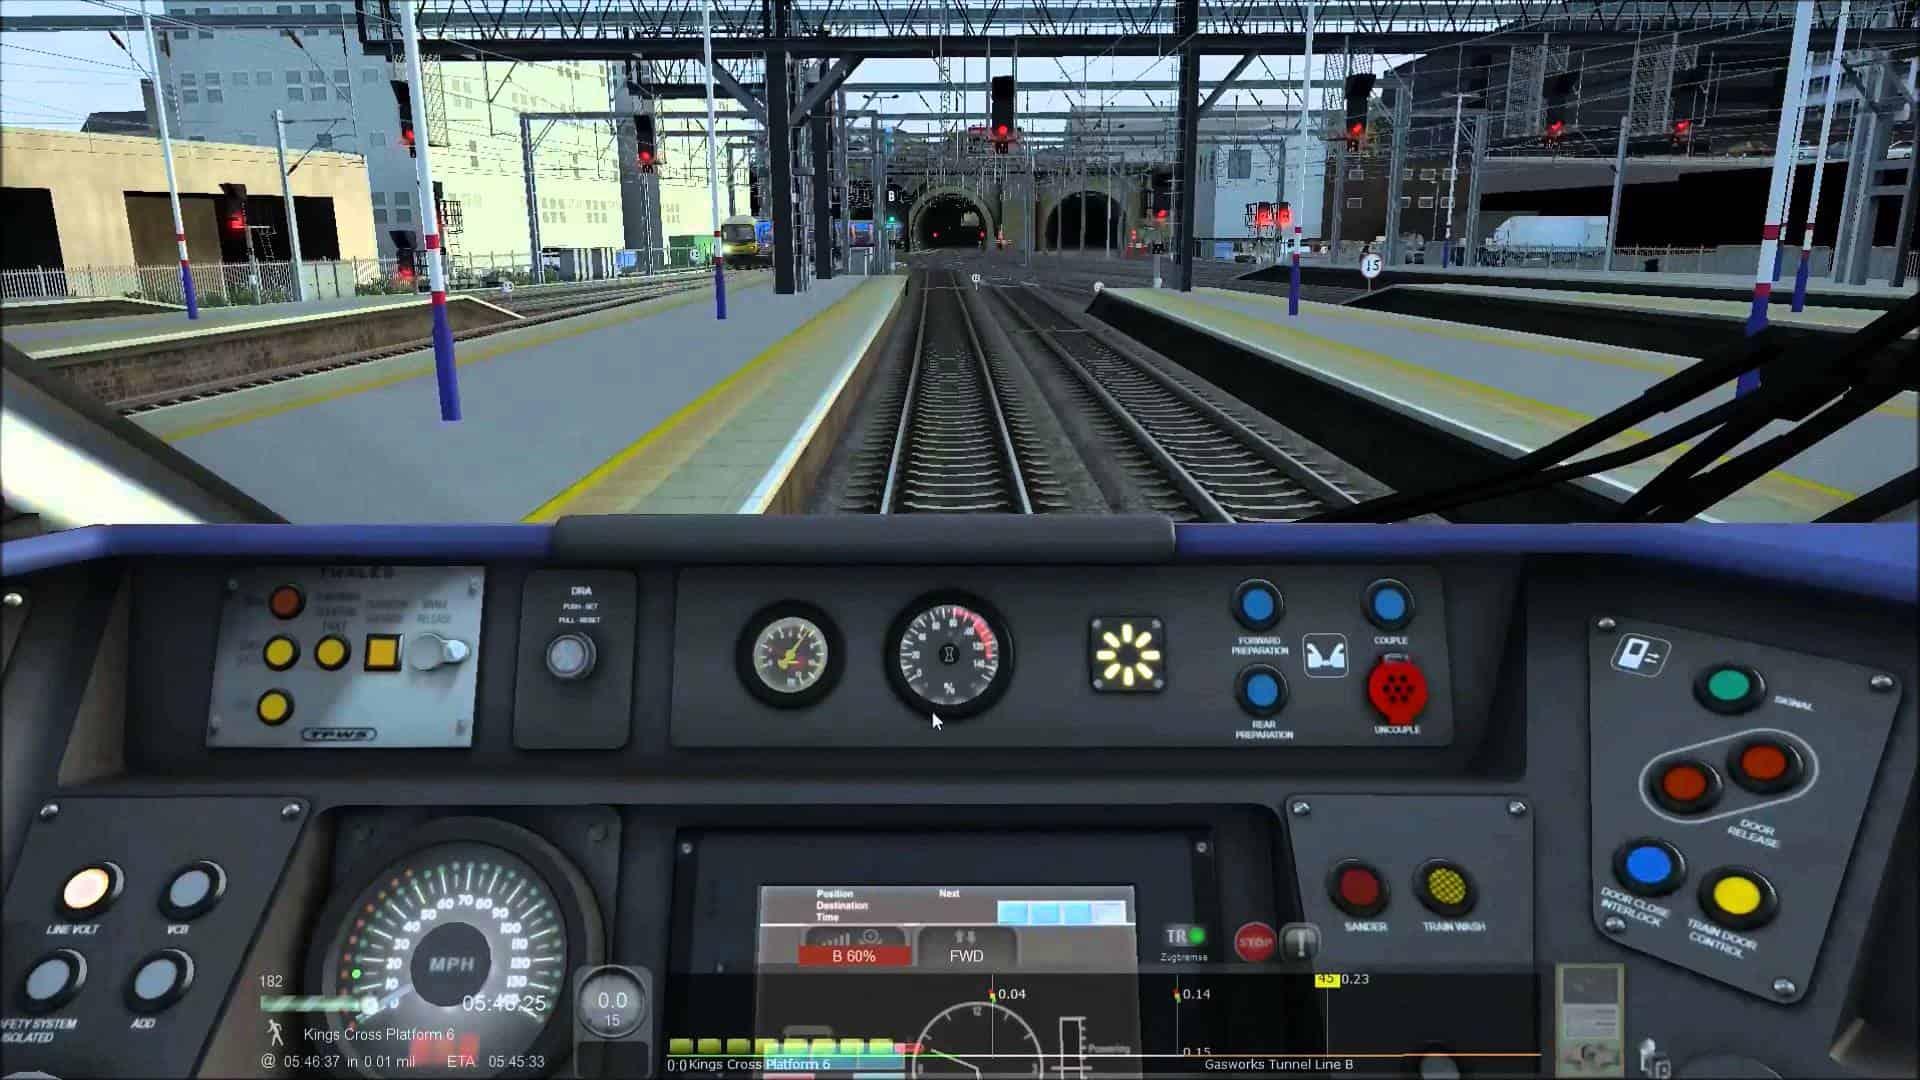 train simulator 2015 gratuit t l charger version compl te pc. Black Bedroom Furniture Sets. Home Design Ideas